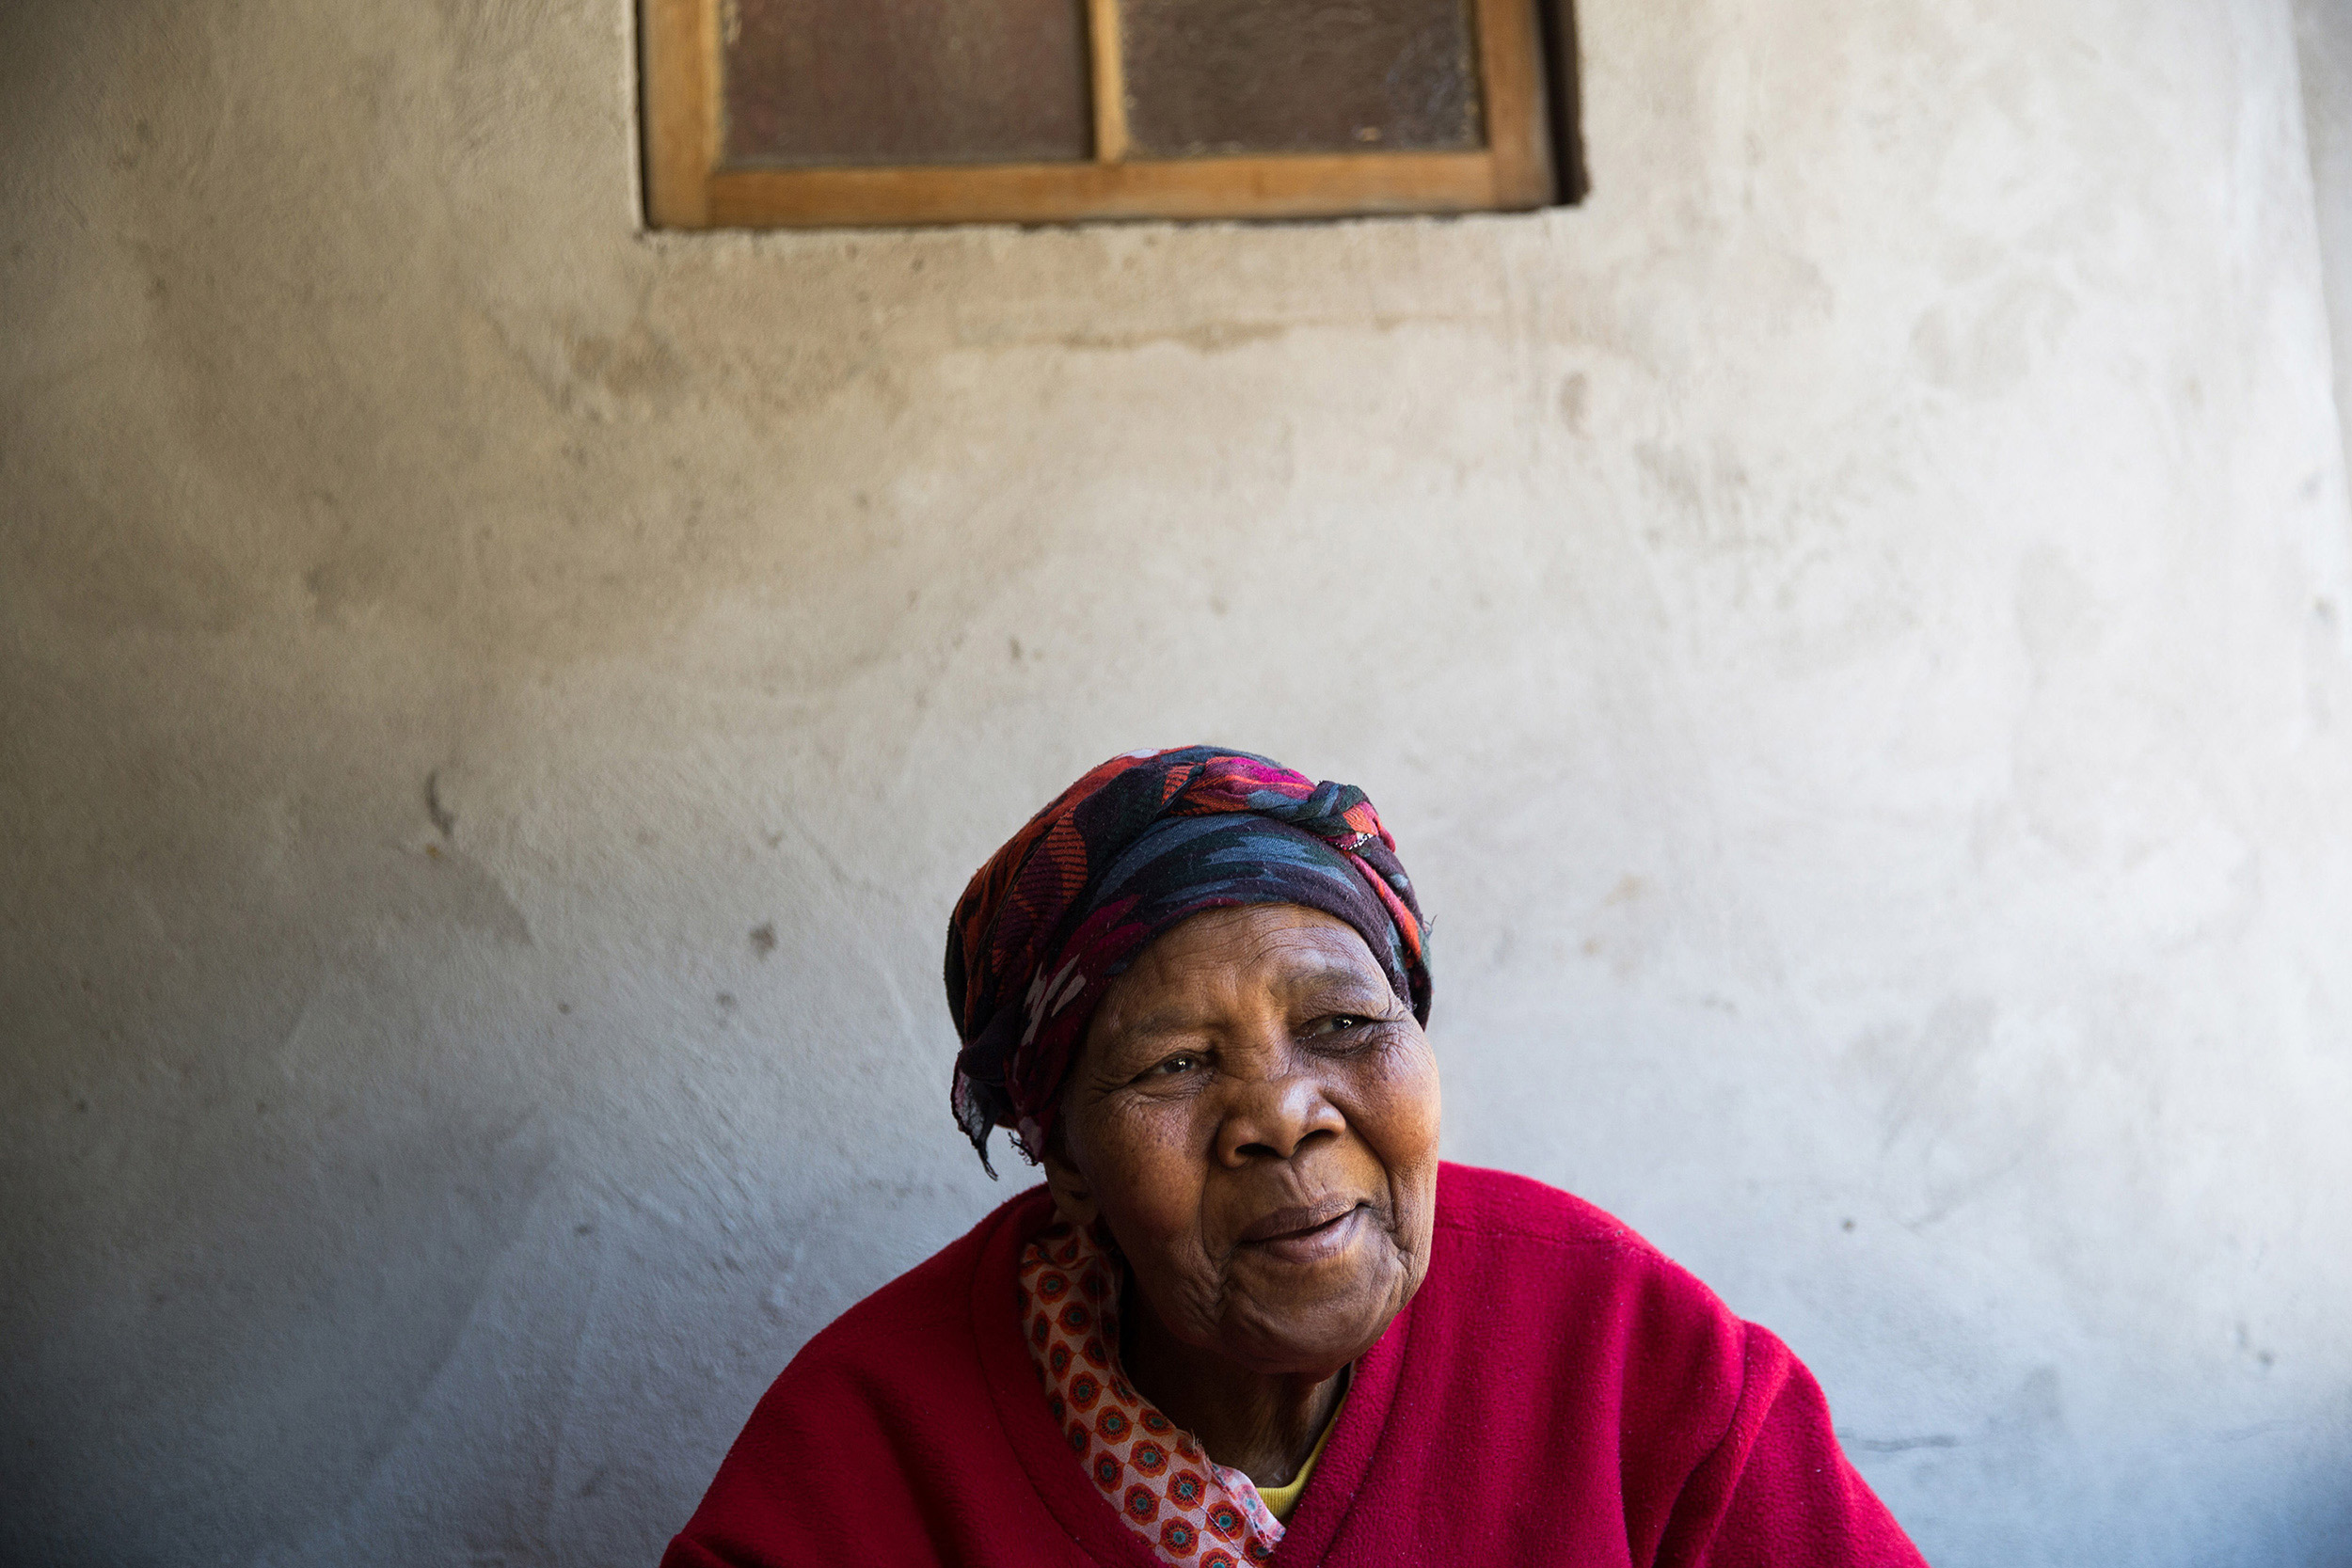 25 November 2018: Nomvula Ngubane cried and thanked God in isiZulu when she heard Clare Stewart's name again after so many years.